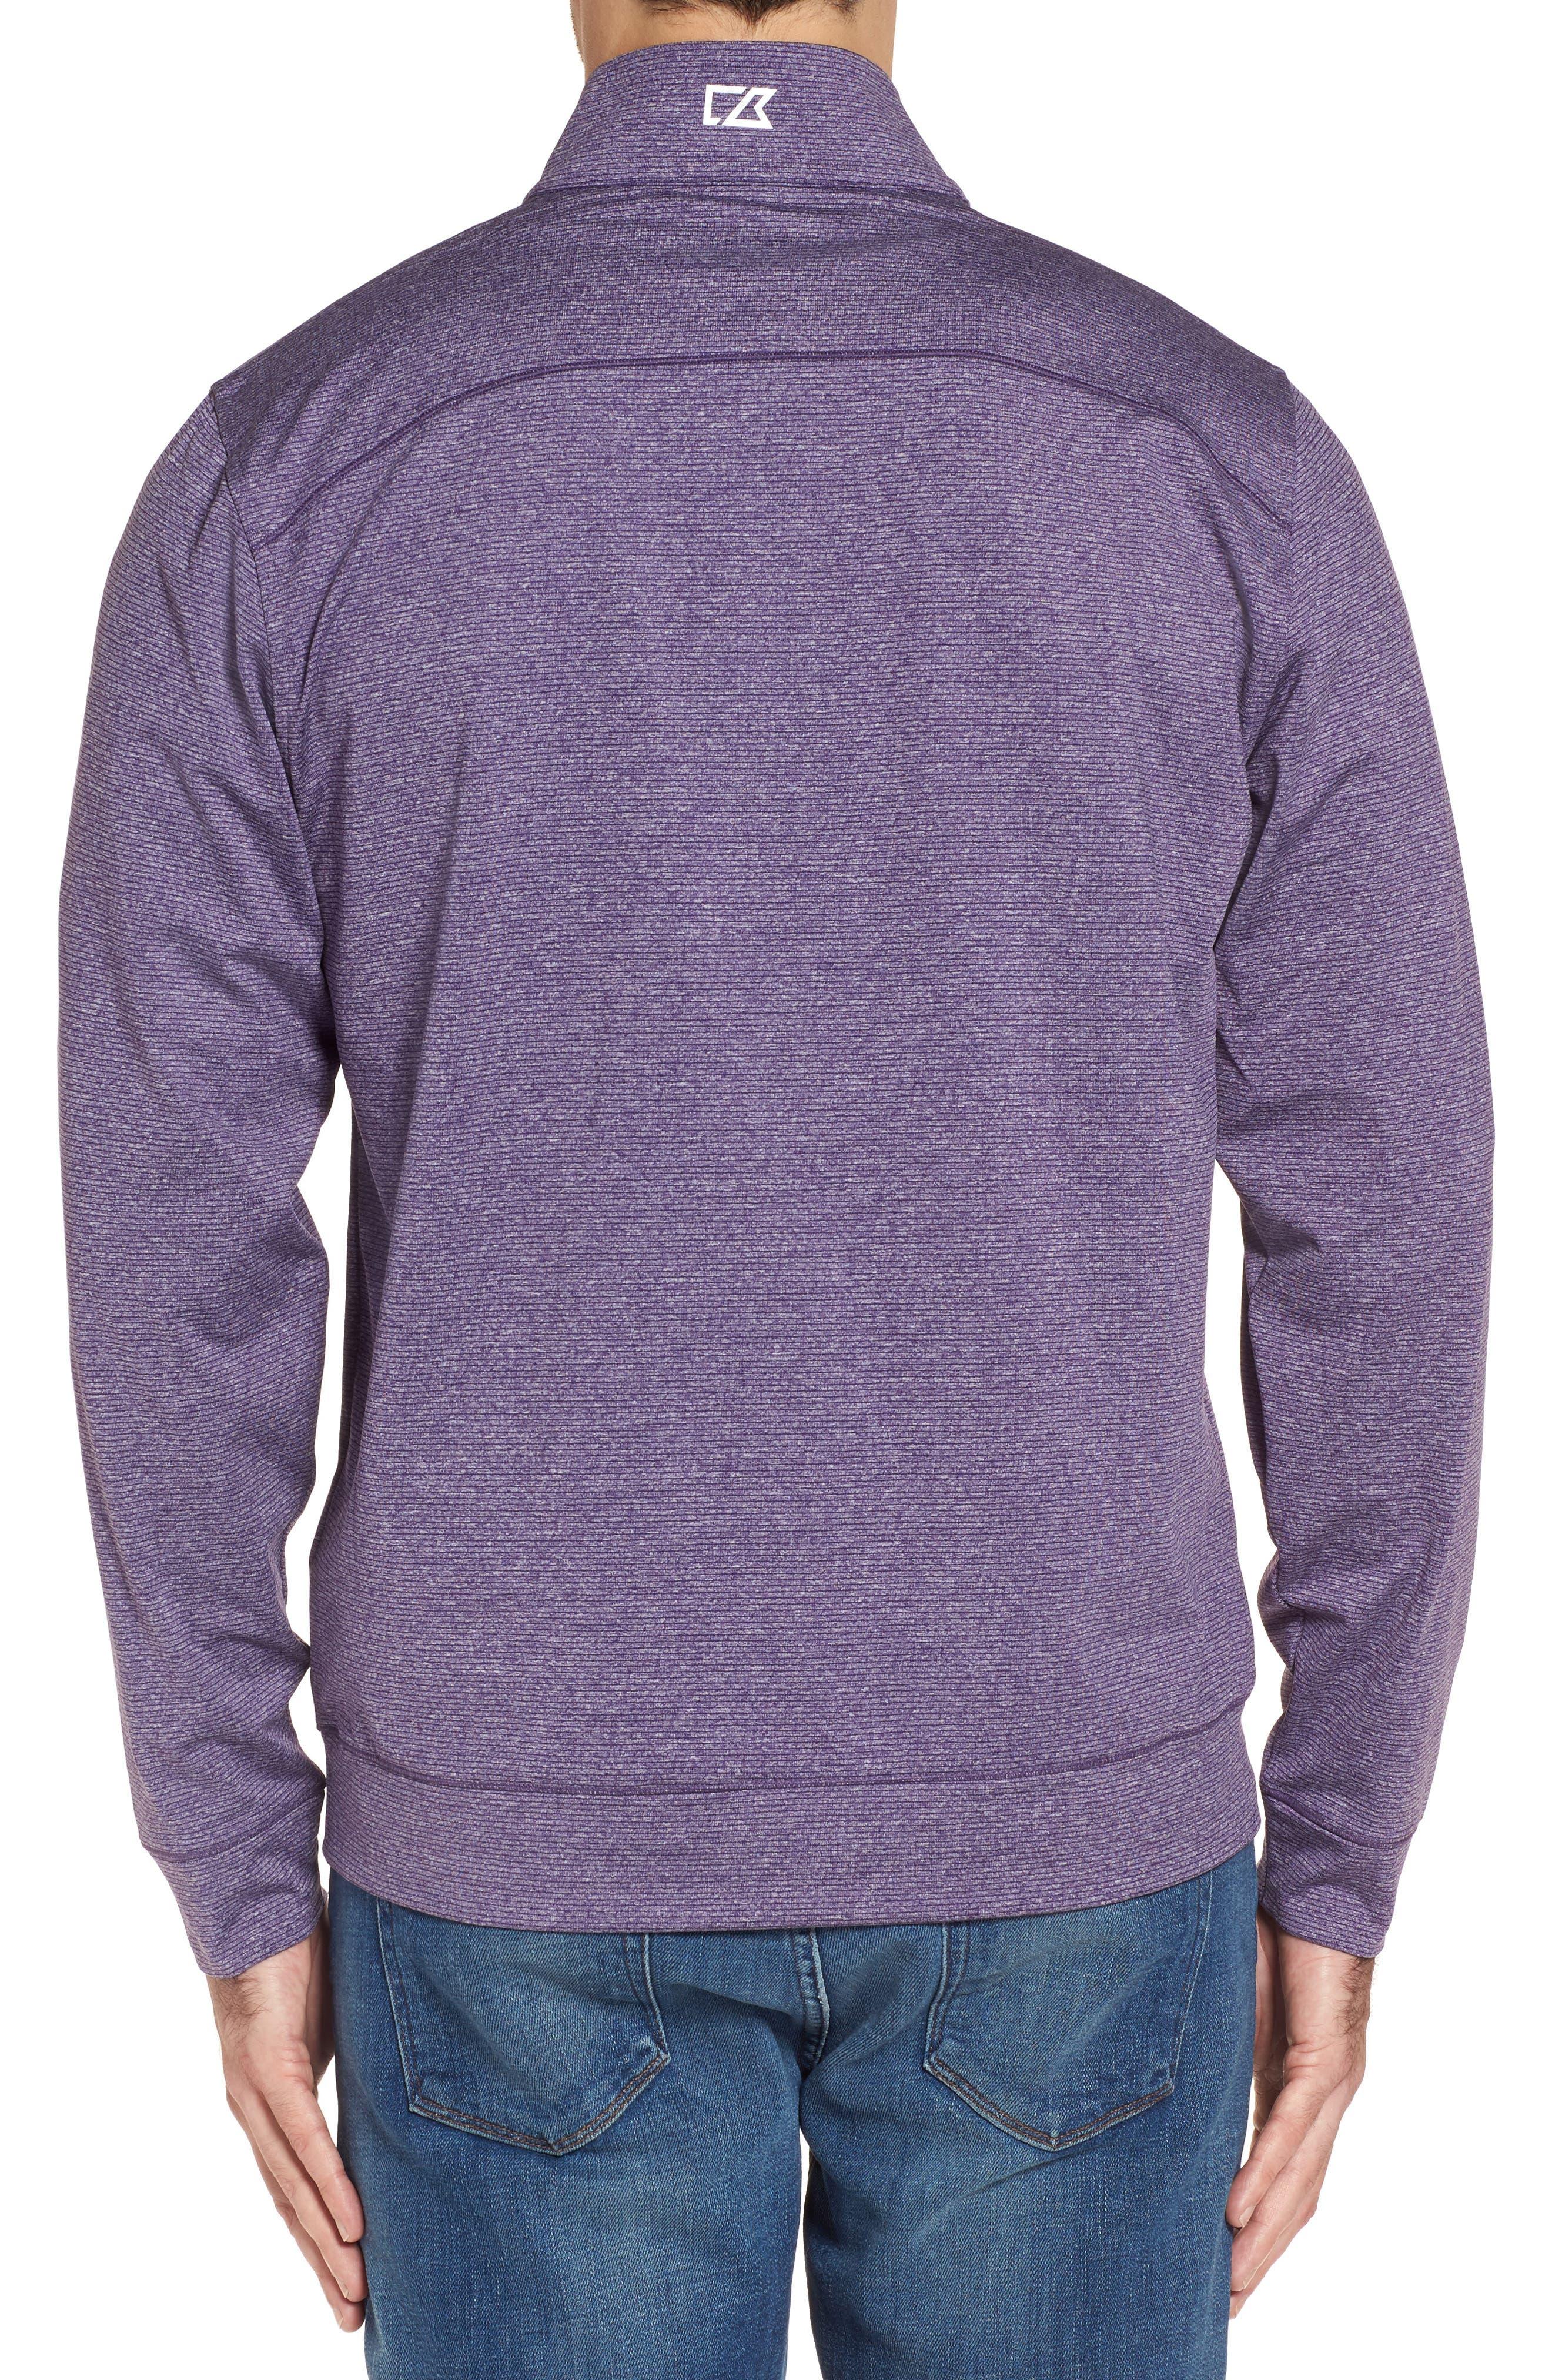 Shoreline - Minnesota Vikings Half Zip Pullover,                             Alternate thumbnail 2, color,                             513